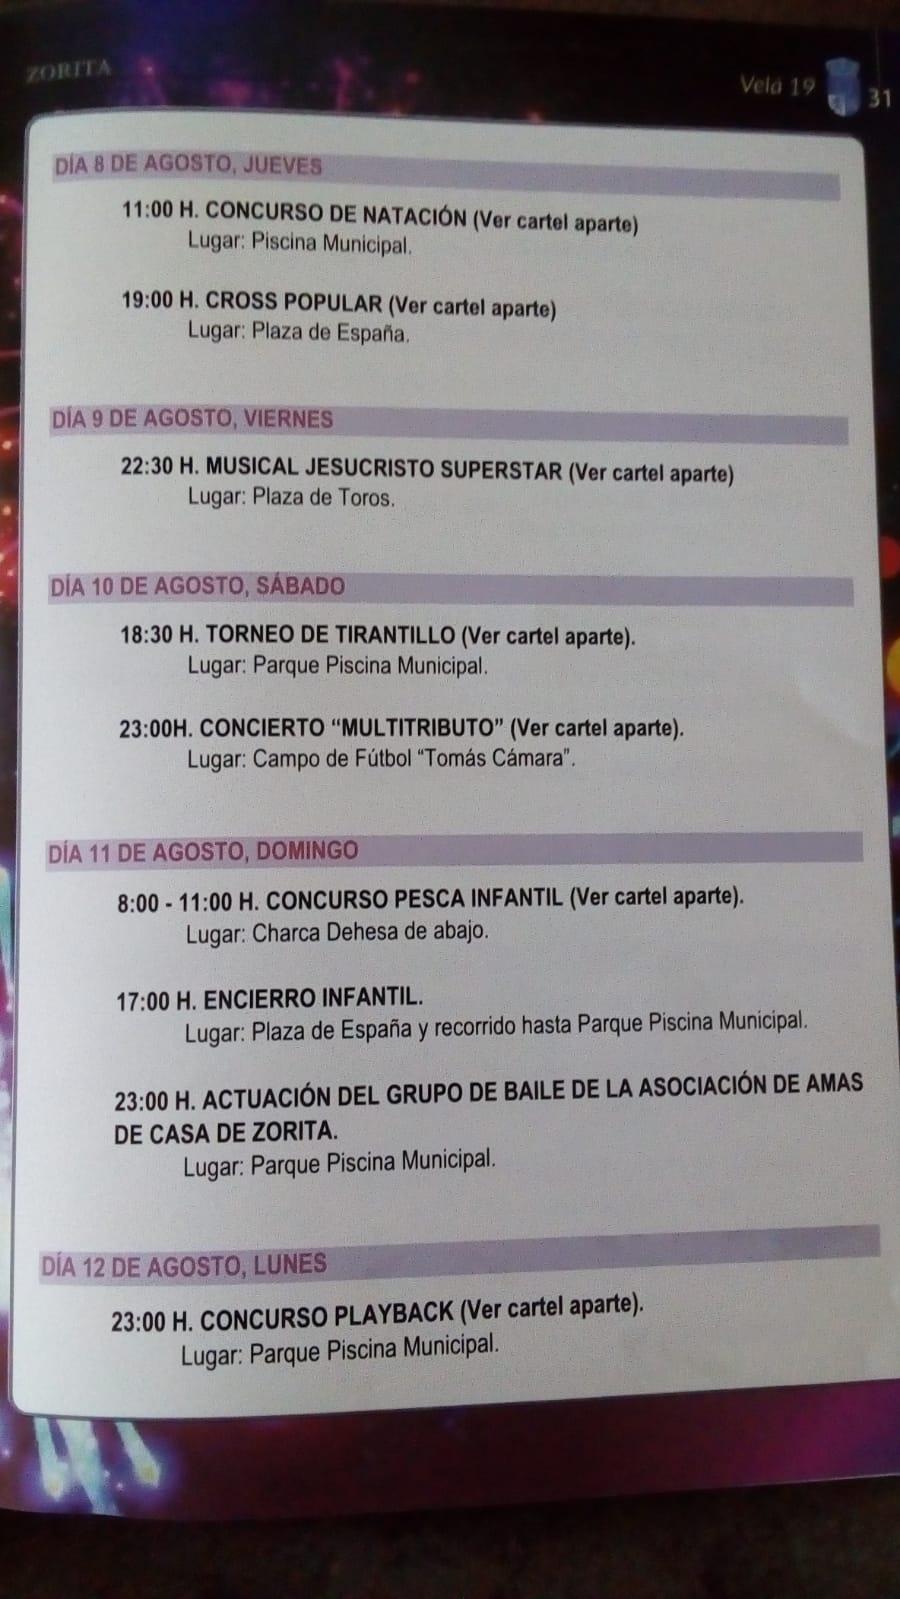 Programa Velá 2019 - Zorita (Cáceres) 2